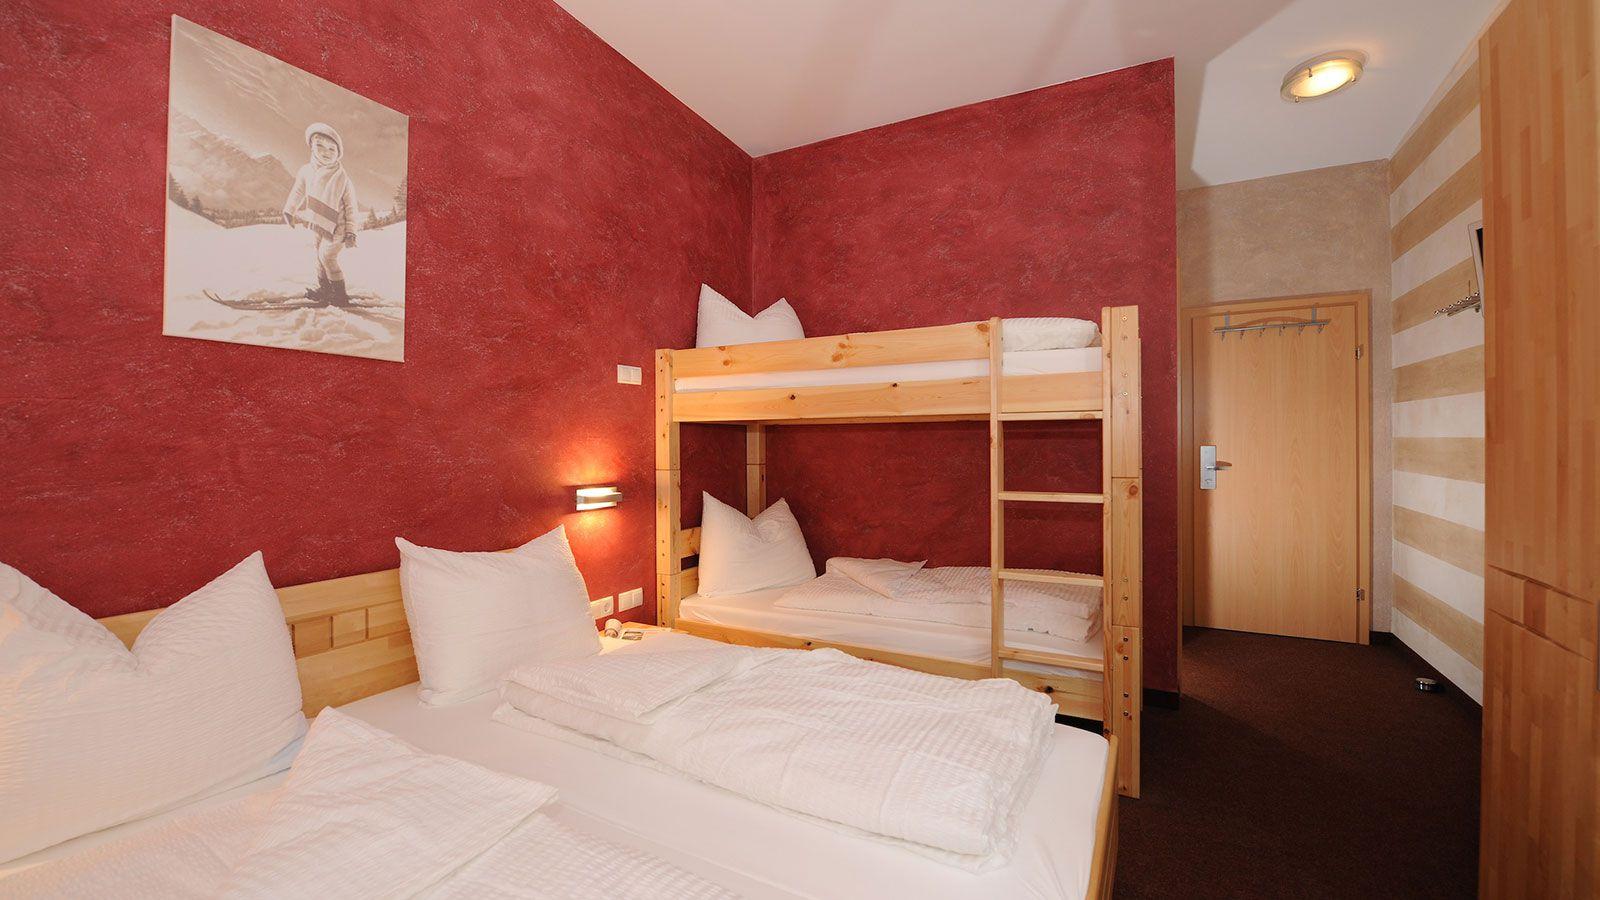 Hotel Wolkensteinblick School Ski Trip Accommodation : SS G Ski Austria Hotel Wildkogel Hotel Wolkensteinblick Bedroom from www.pgl.co.uk size 1600 x 900 jpeg 163kB